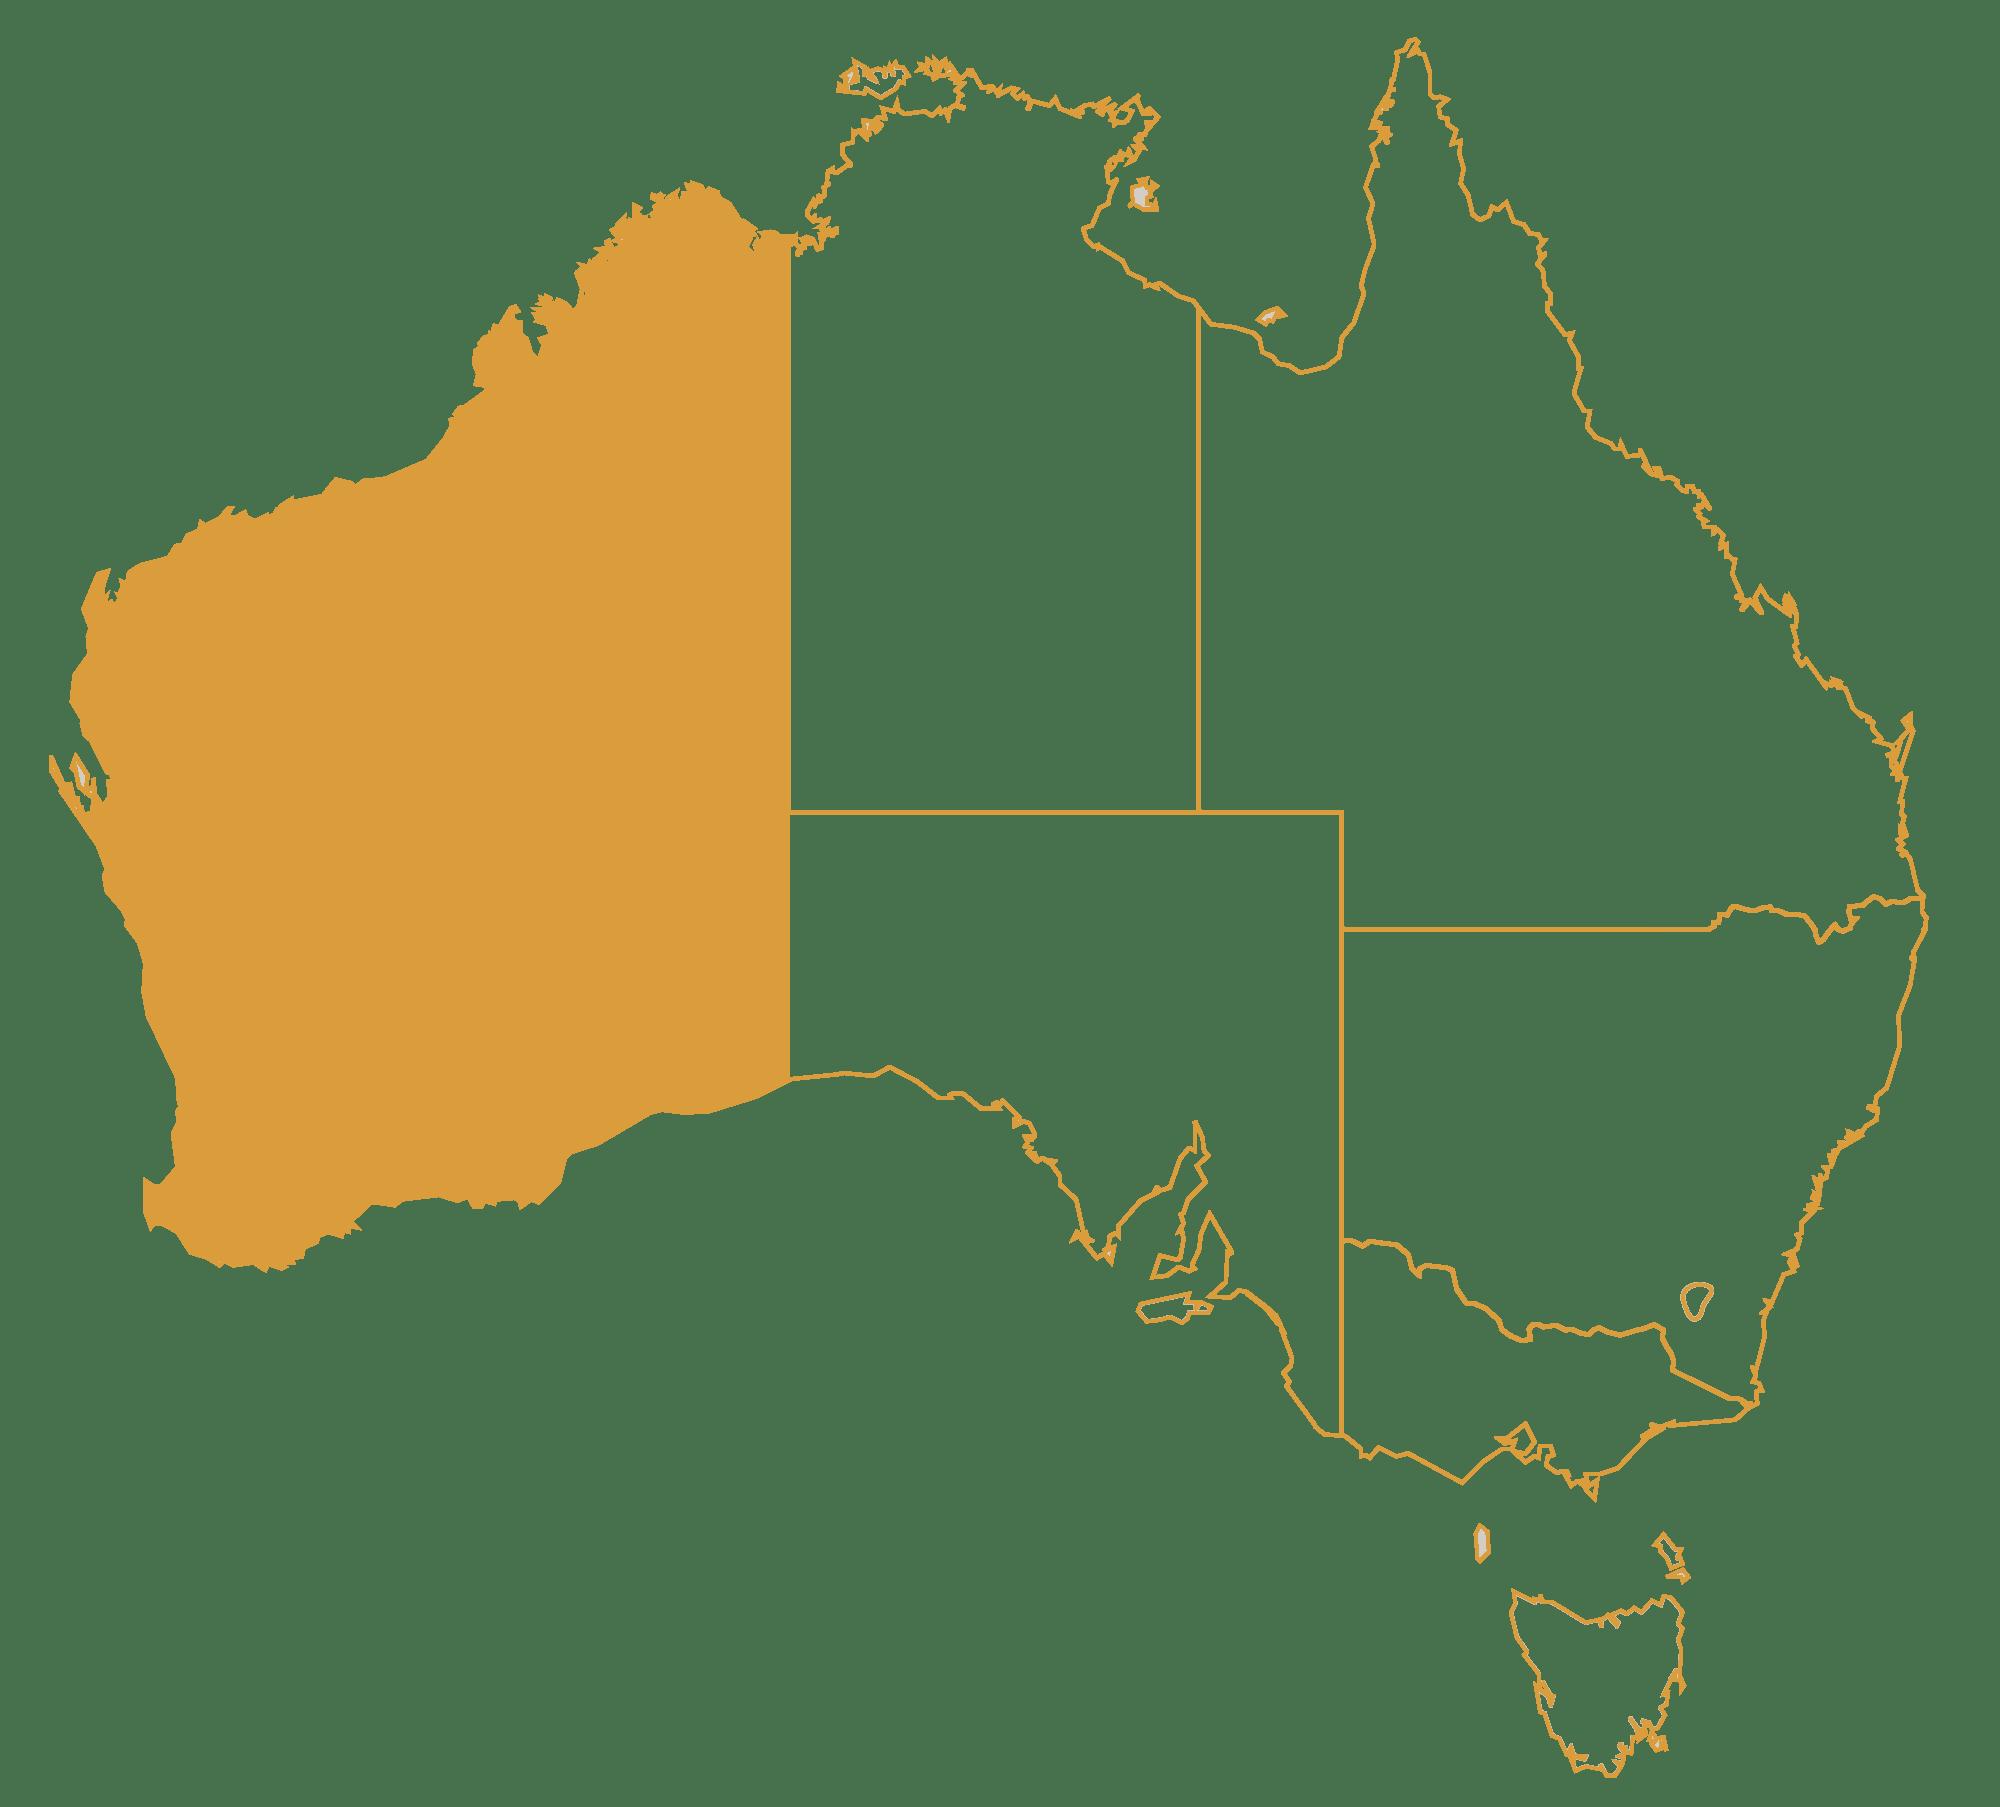 Australia-WesternAustralia